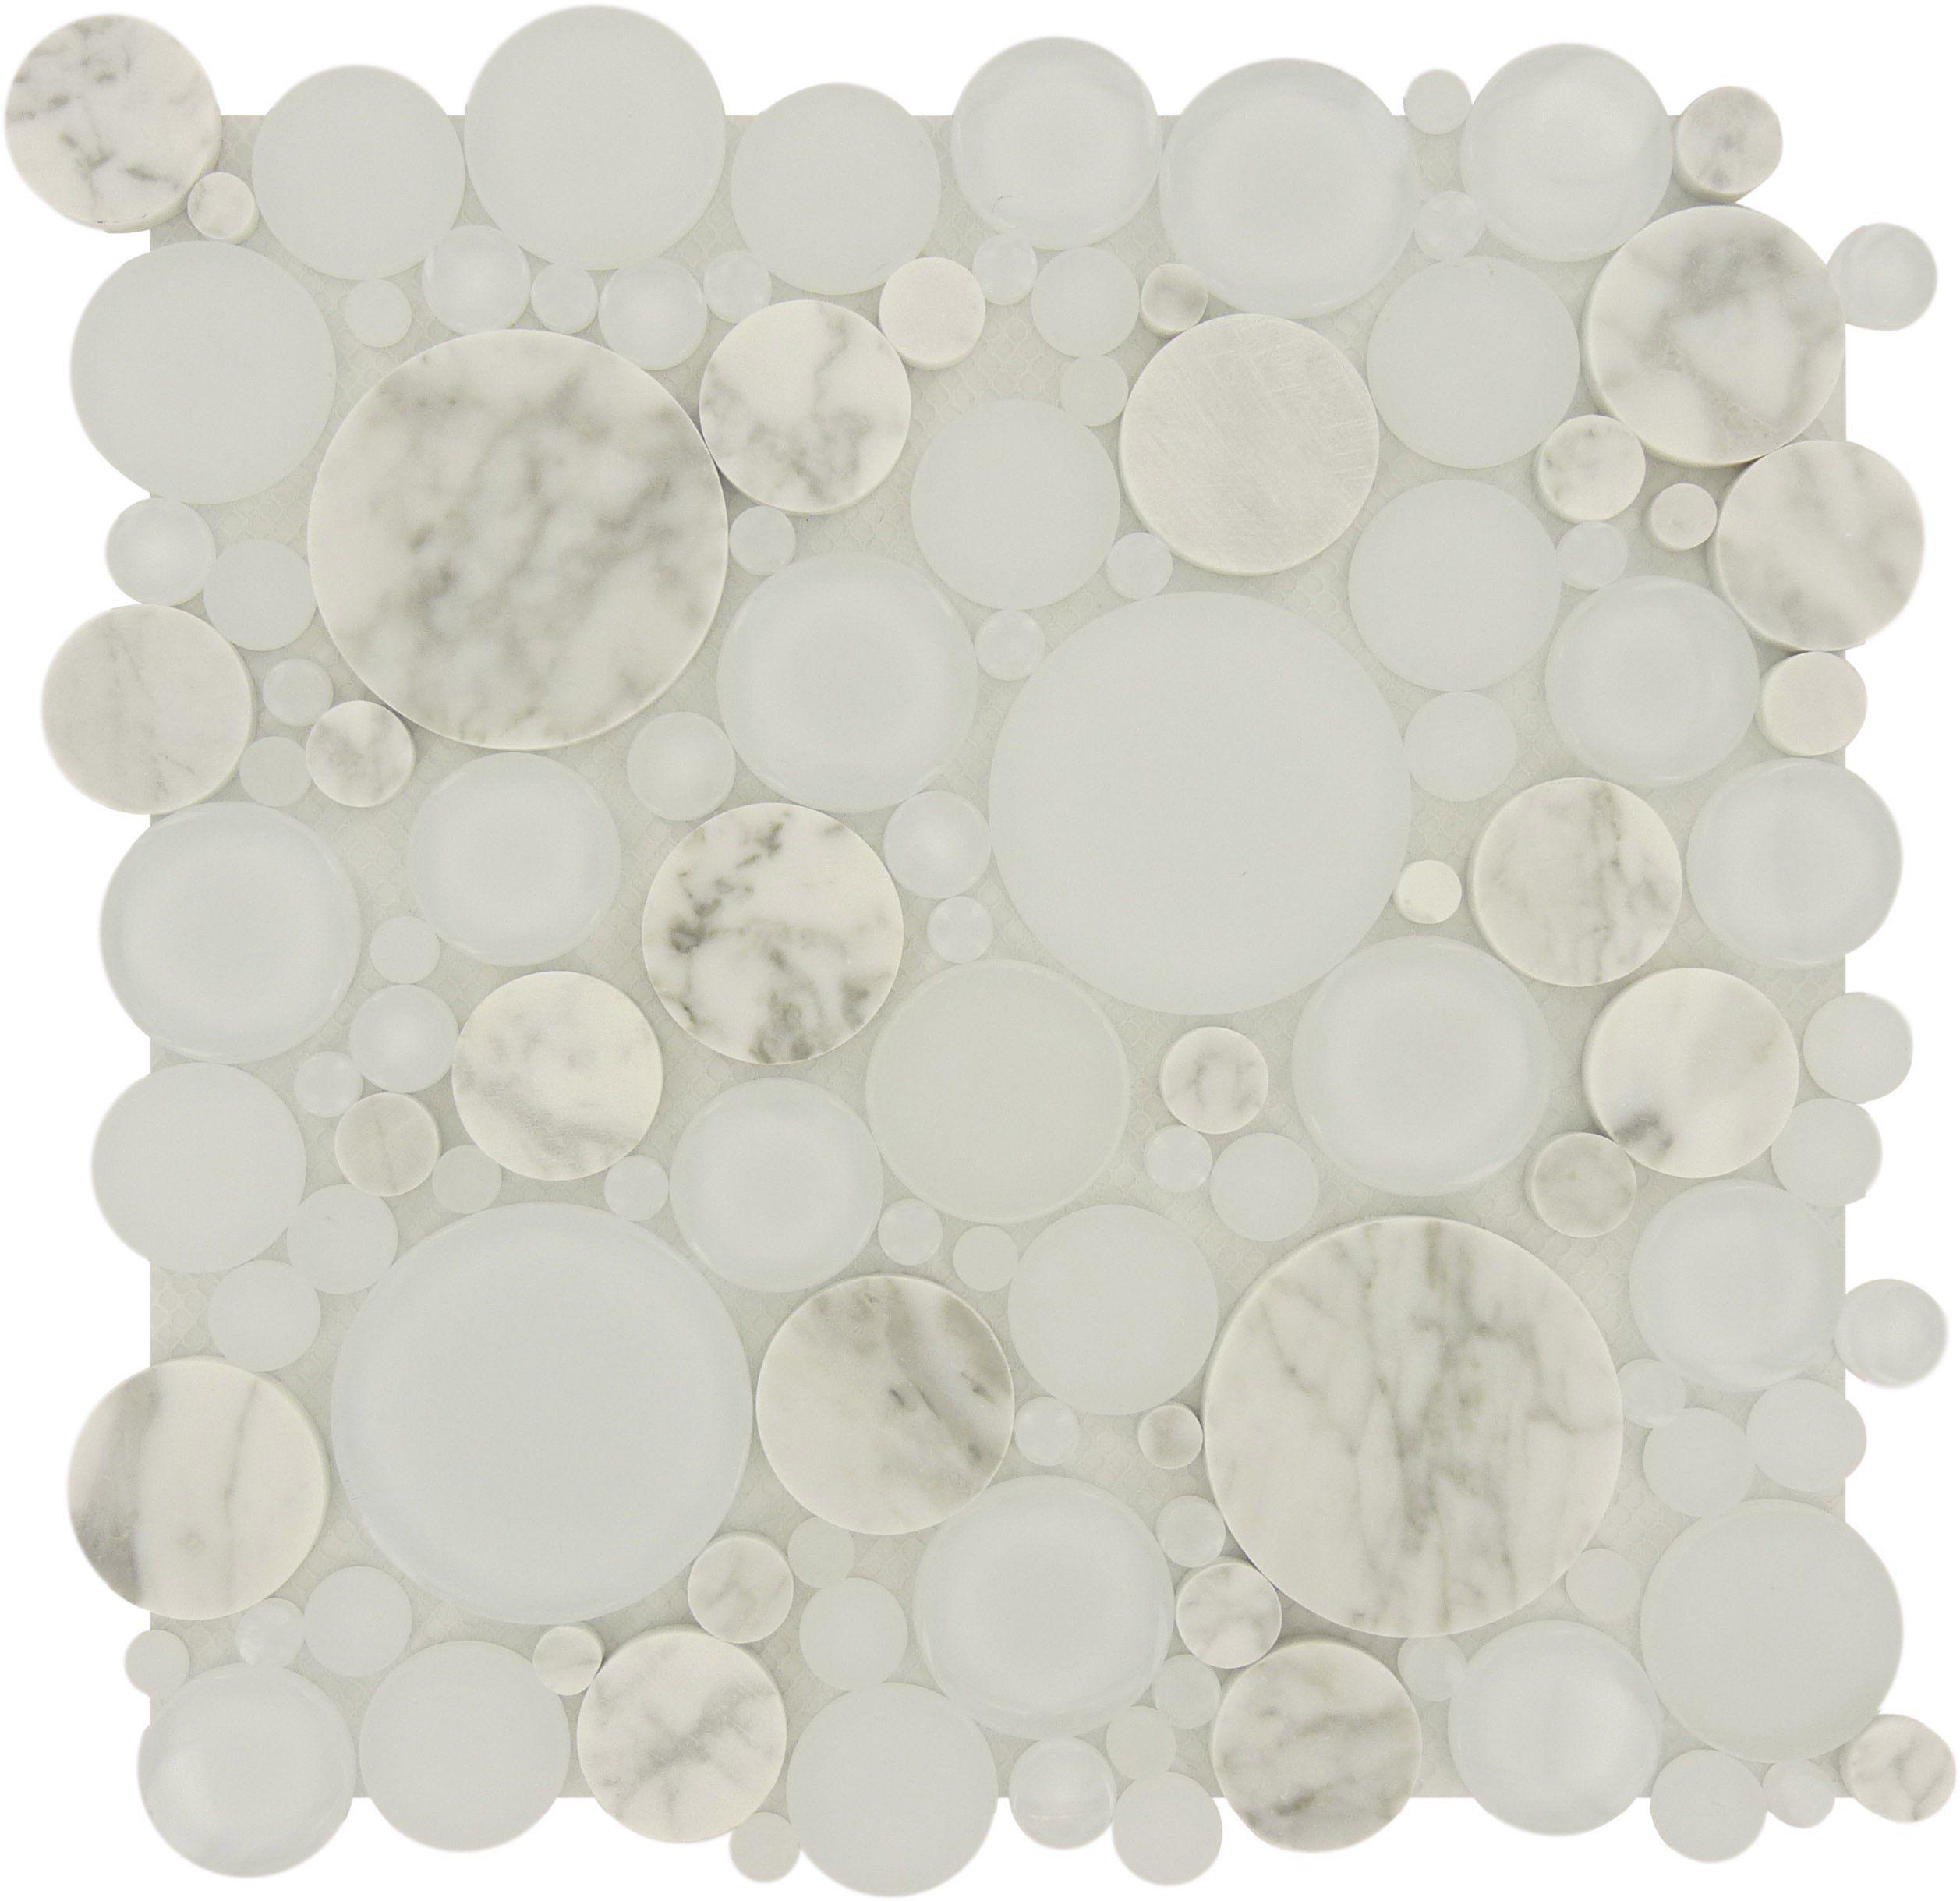 Sheet Size 12 X 12 Tile Size Circles Tiles Per Sheet 120 Tile Thickness 1 4 Grout Joints 1 8 Sheet Mount Green Mosaic Tiles Glitter Tiles Bubble Glass